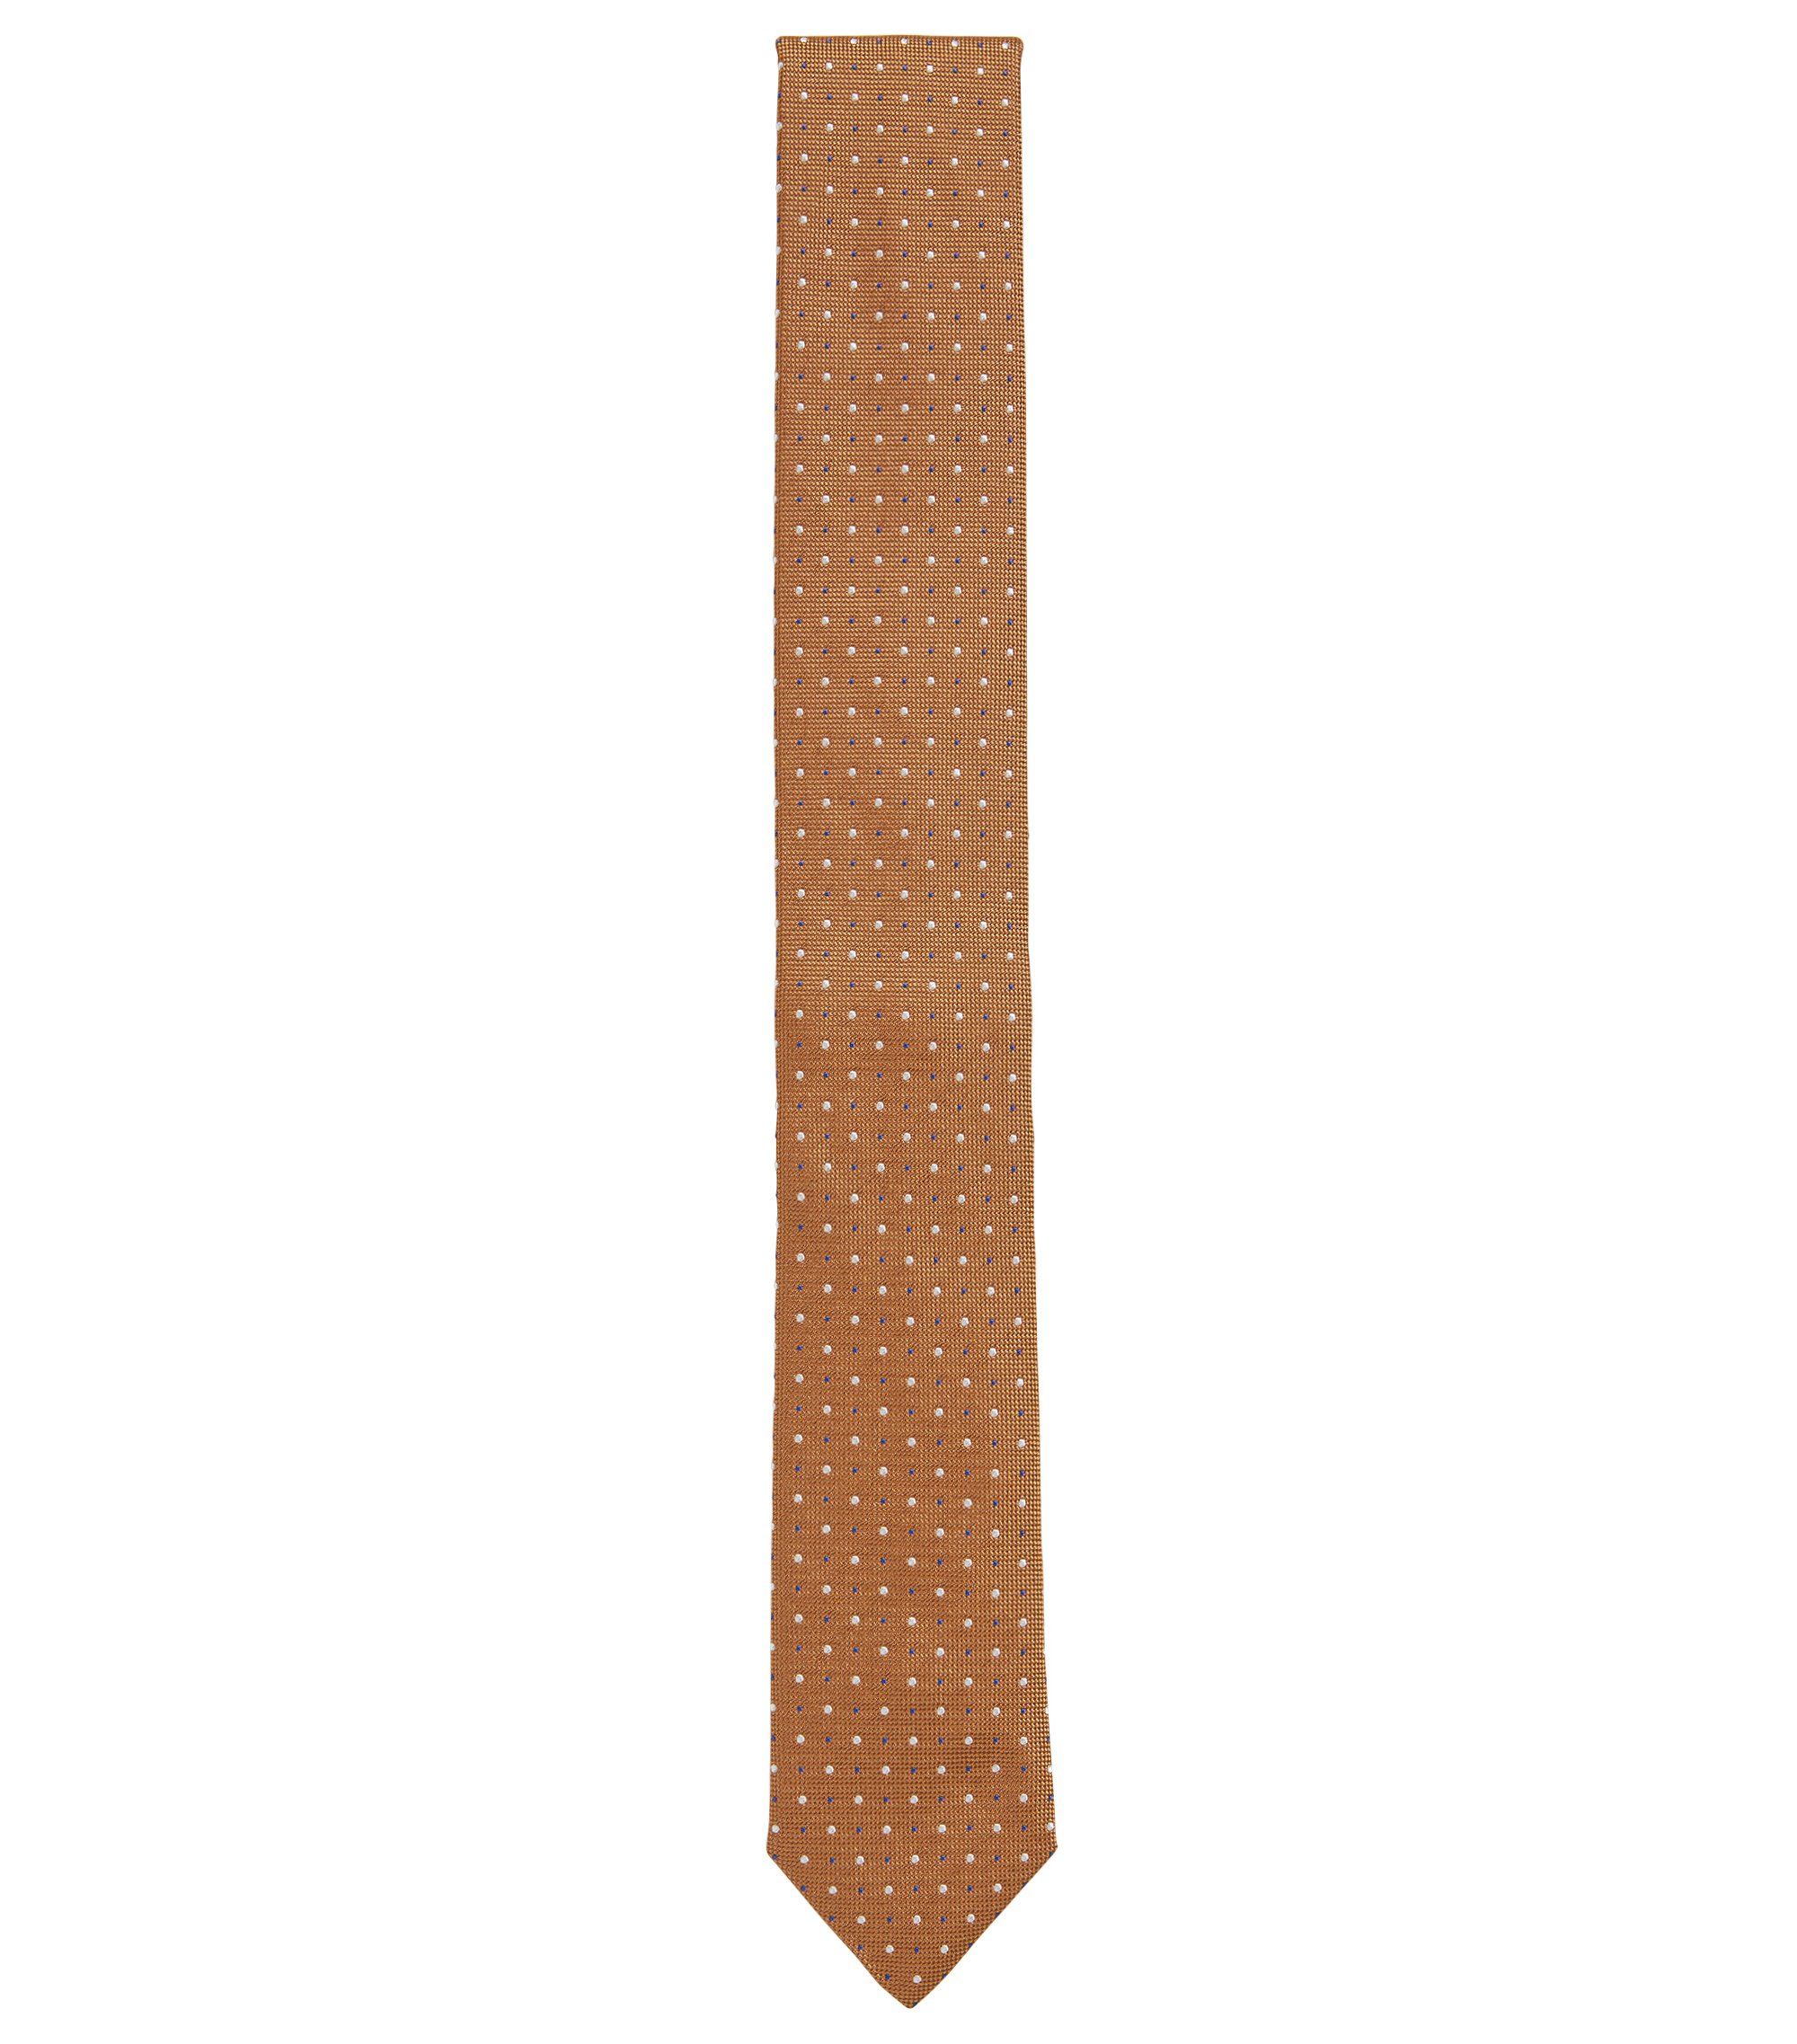 Corbata estampada en pura seda, Marrón